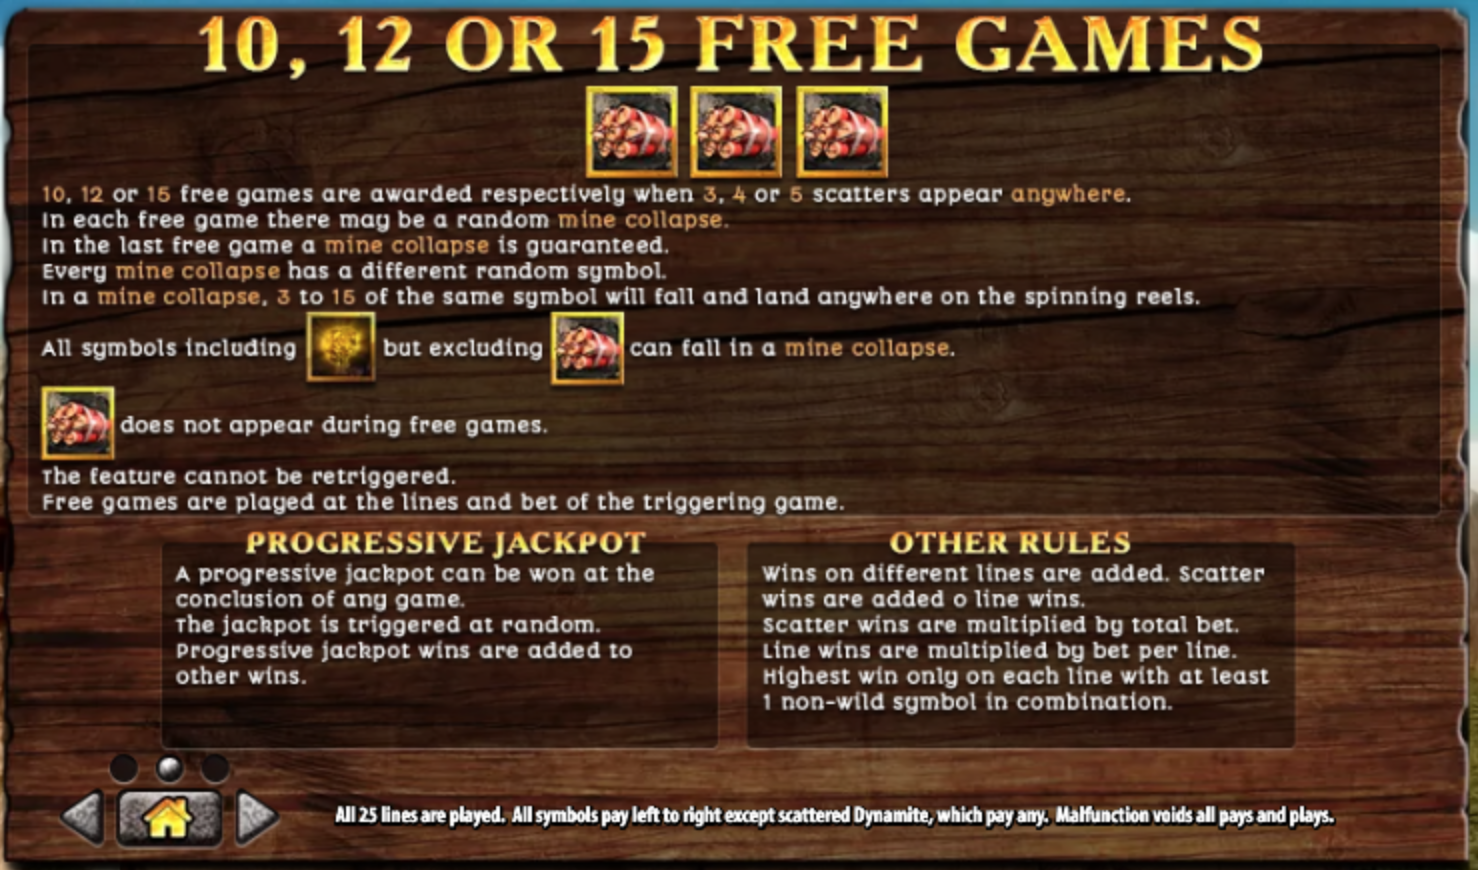 Bonus games rules